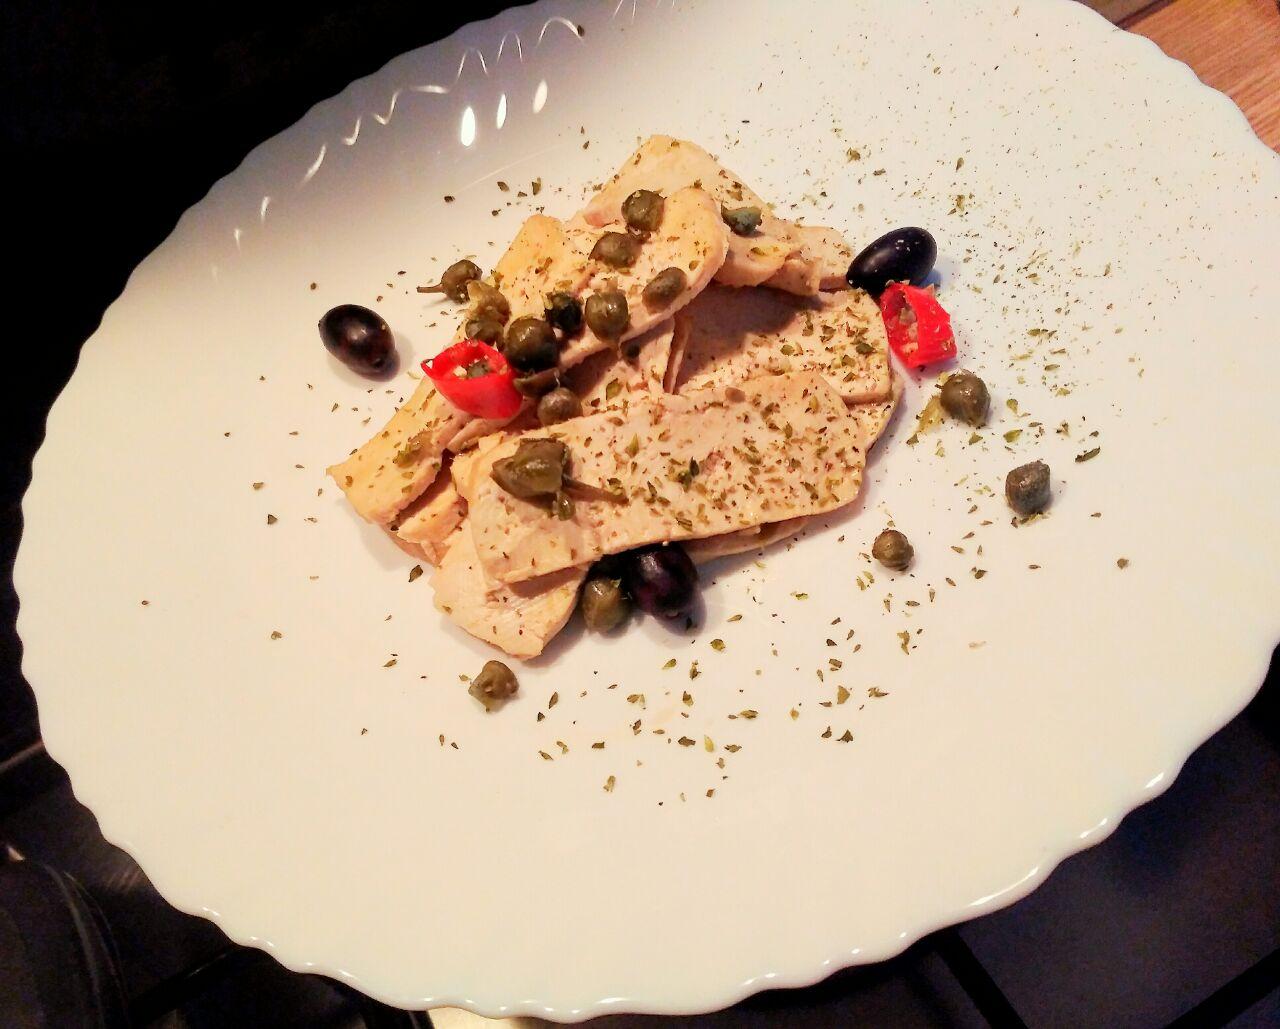 Ricette vegane: tofu in veste mediterranea